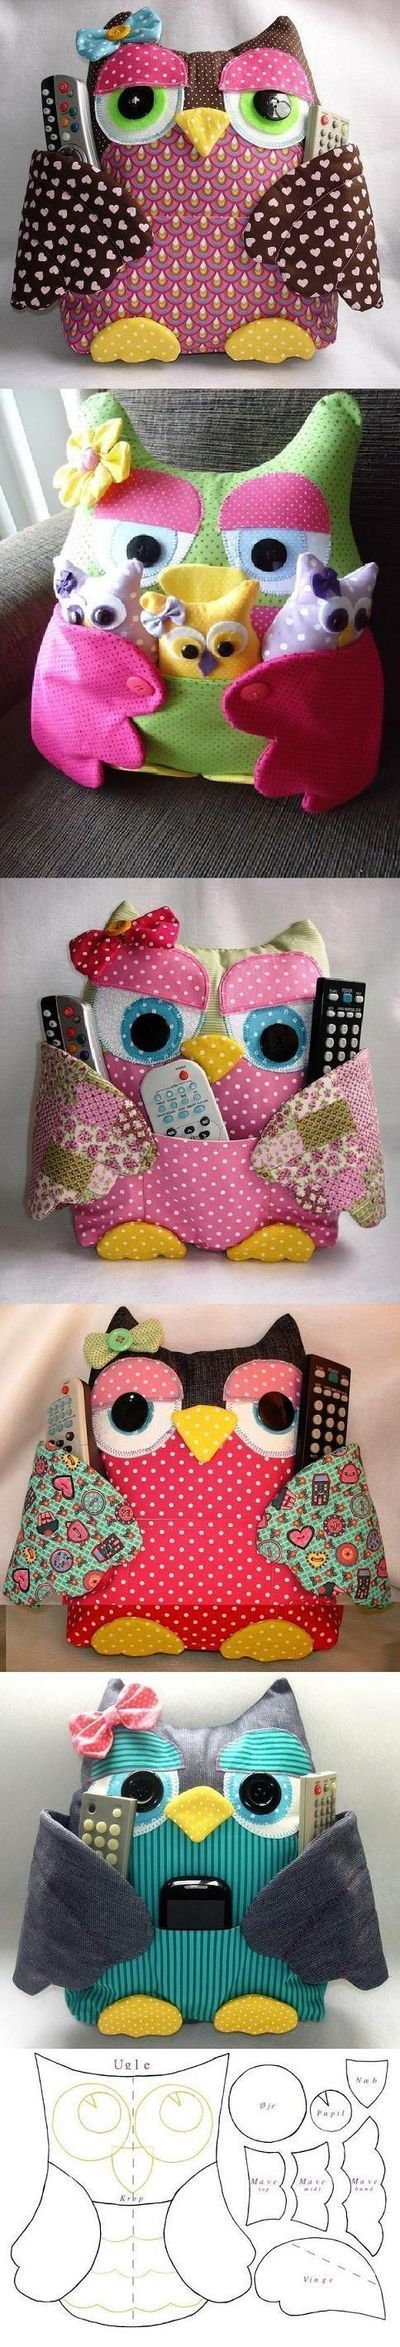 Owl crafts baby bedding nursery decor nursery crafts forward pink owl - Diy Owl Pad With Pockets Diy Owl Pad With Pockets Love The Mama Owl And Babies